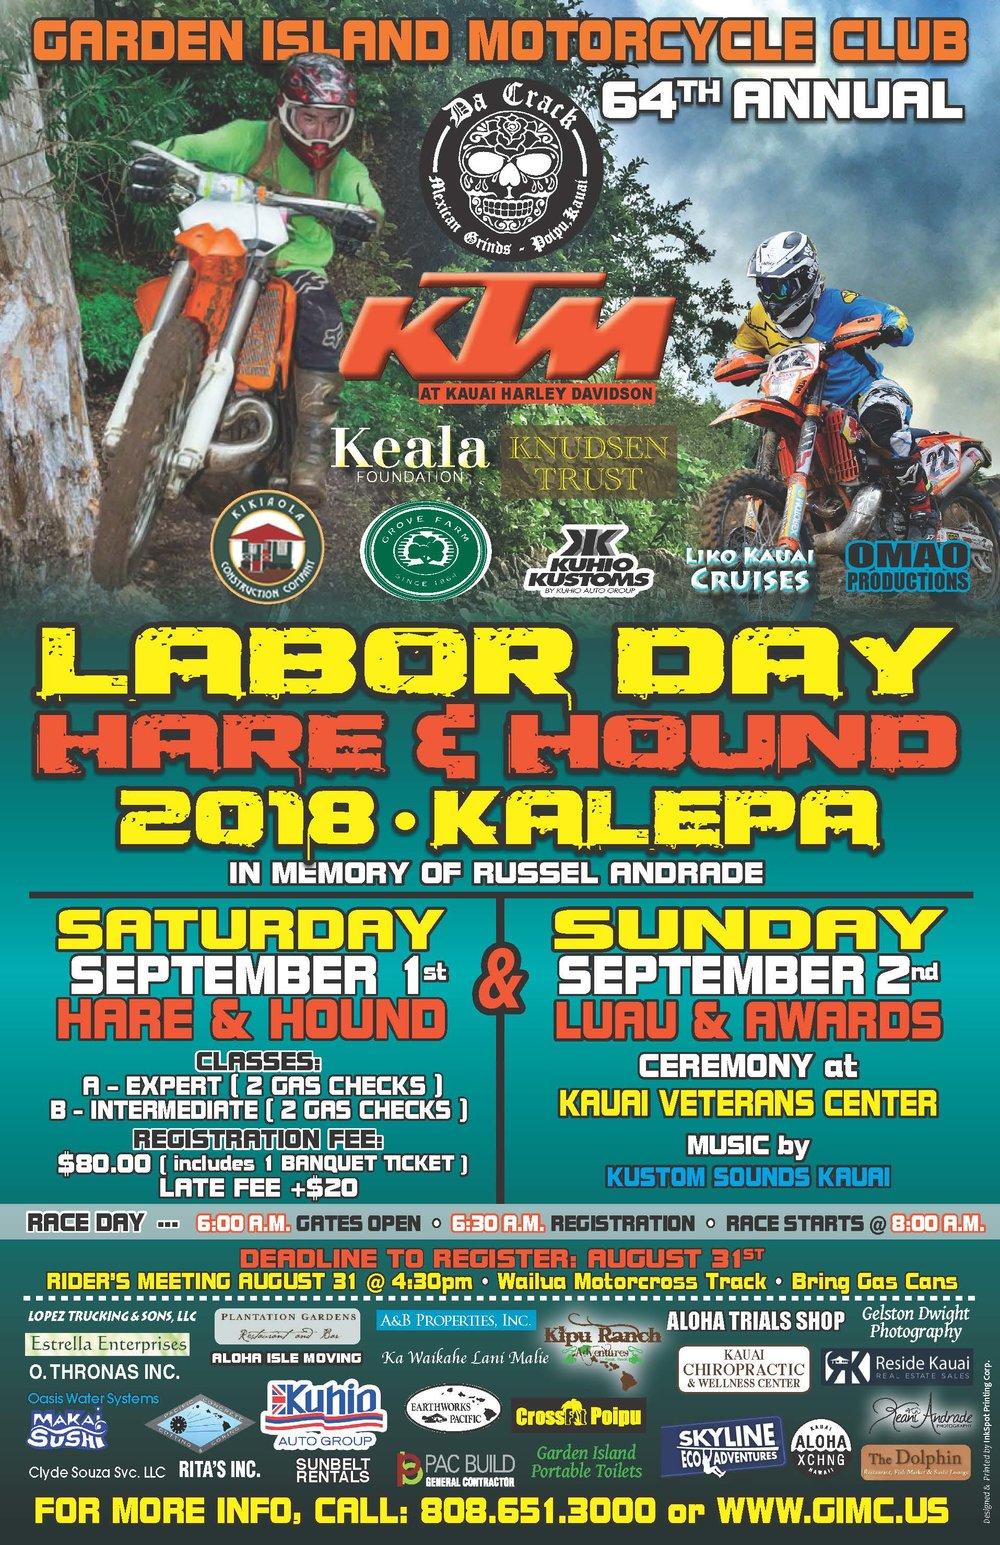 WEB Garden Island Motorcycle Club 63rd Annual Hare & Hound Poster.2.jpg